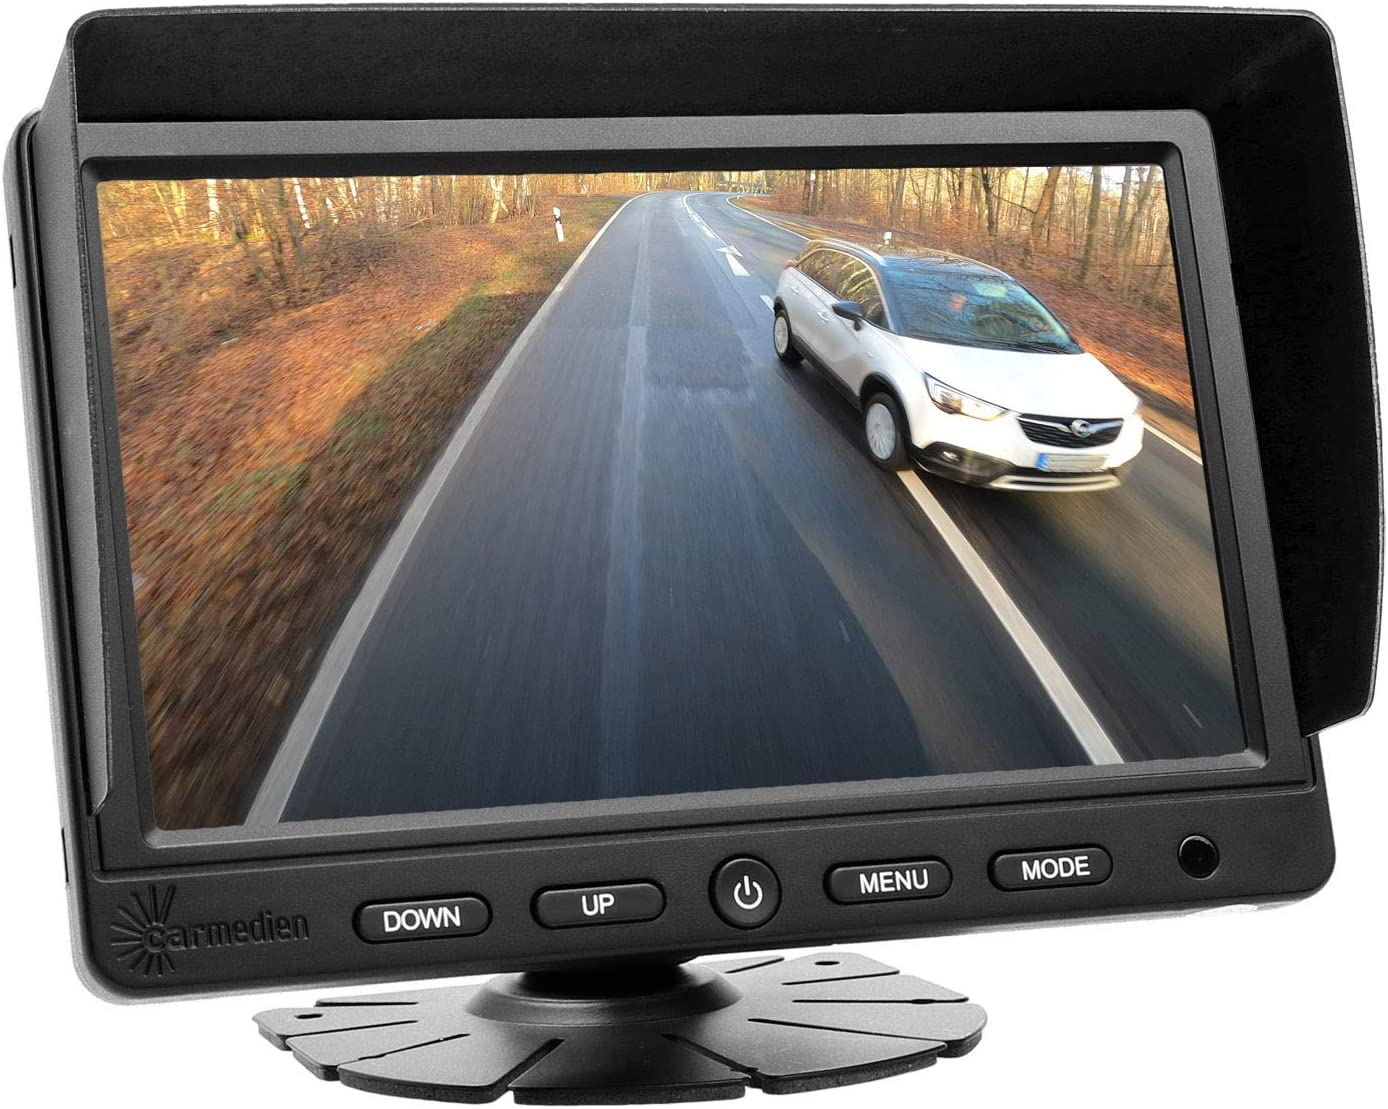 Carmedien Premium Rückfahrsystem Cm Dskrfs2 Mit Twin Doppel Shutter Rückfahrkamera Inkl Scheibenwischer Auto